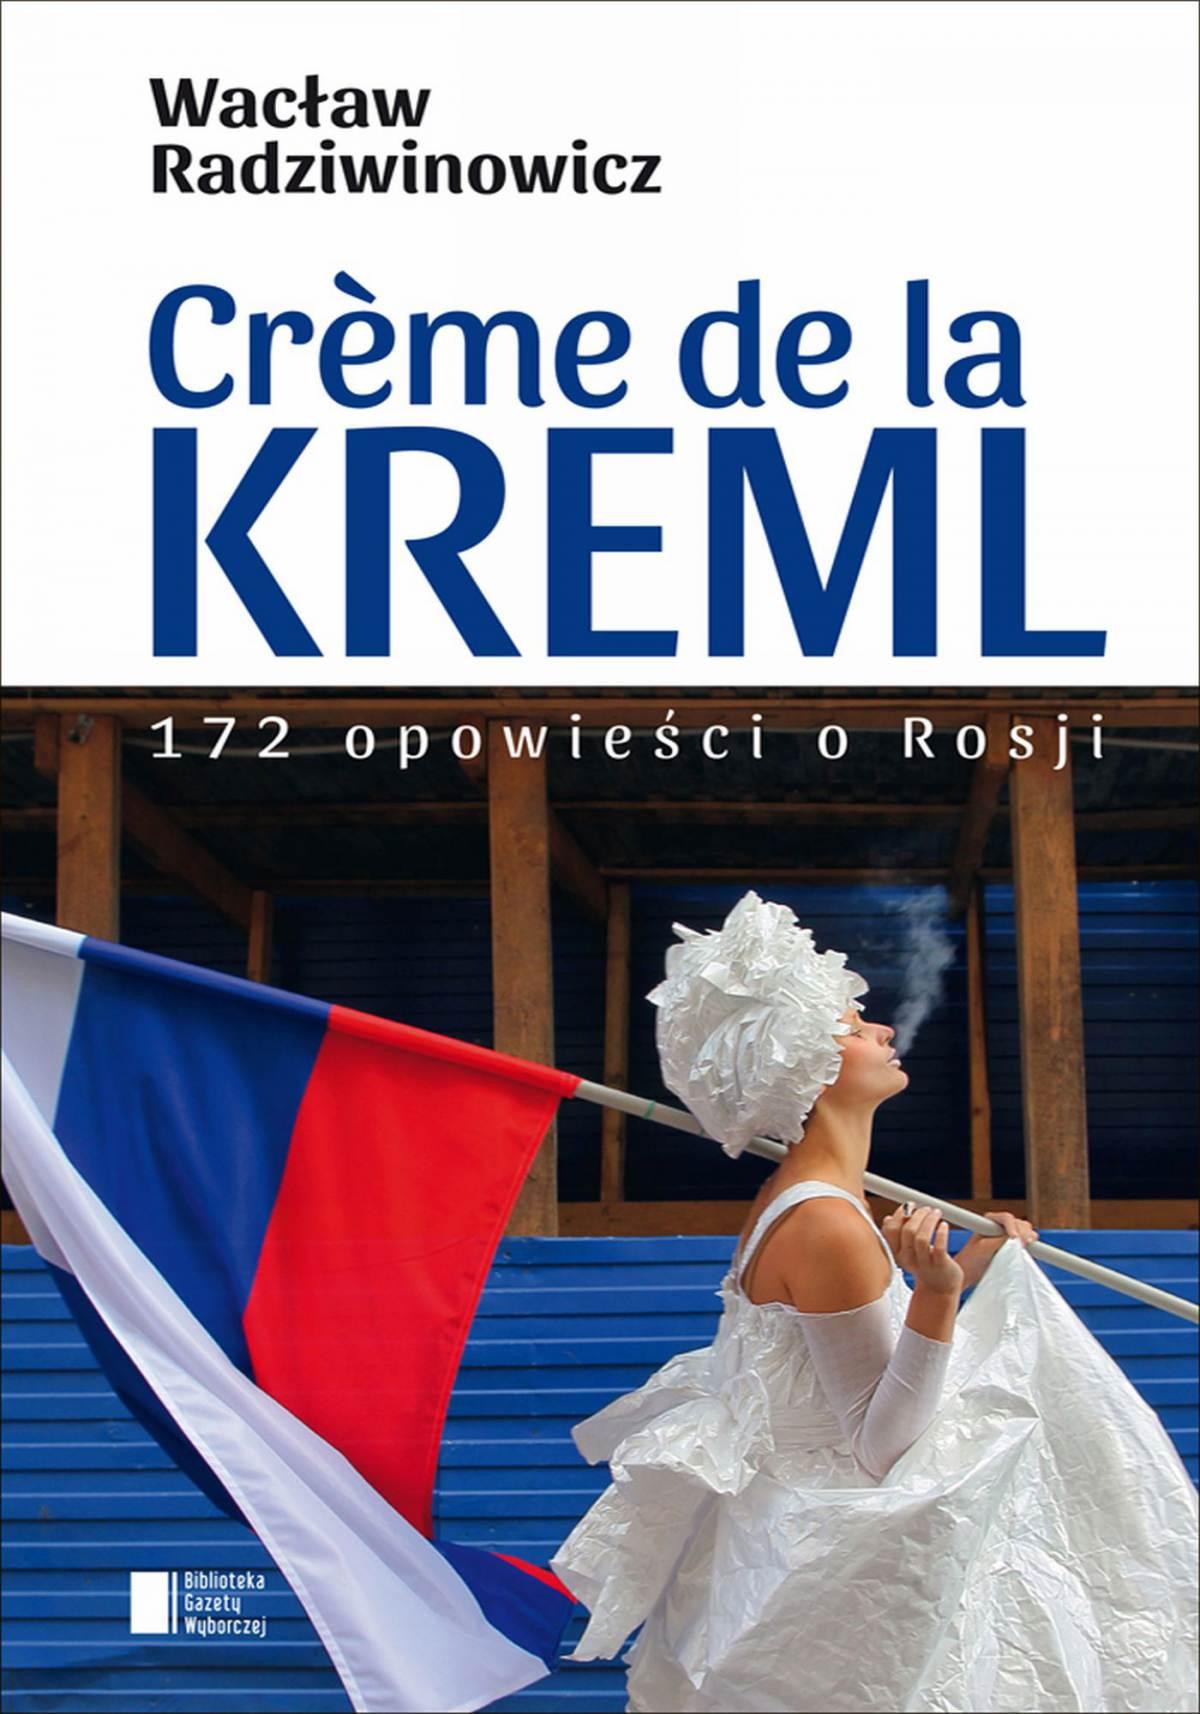 Creme de la Kreml - Ebook (Książka EPUB) do pobrania w formacie EPUB